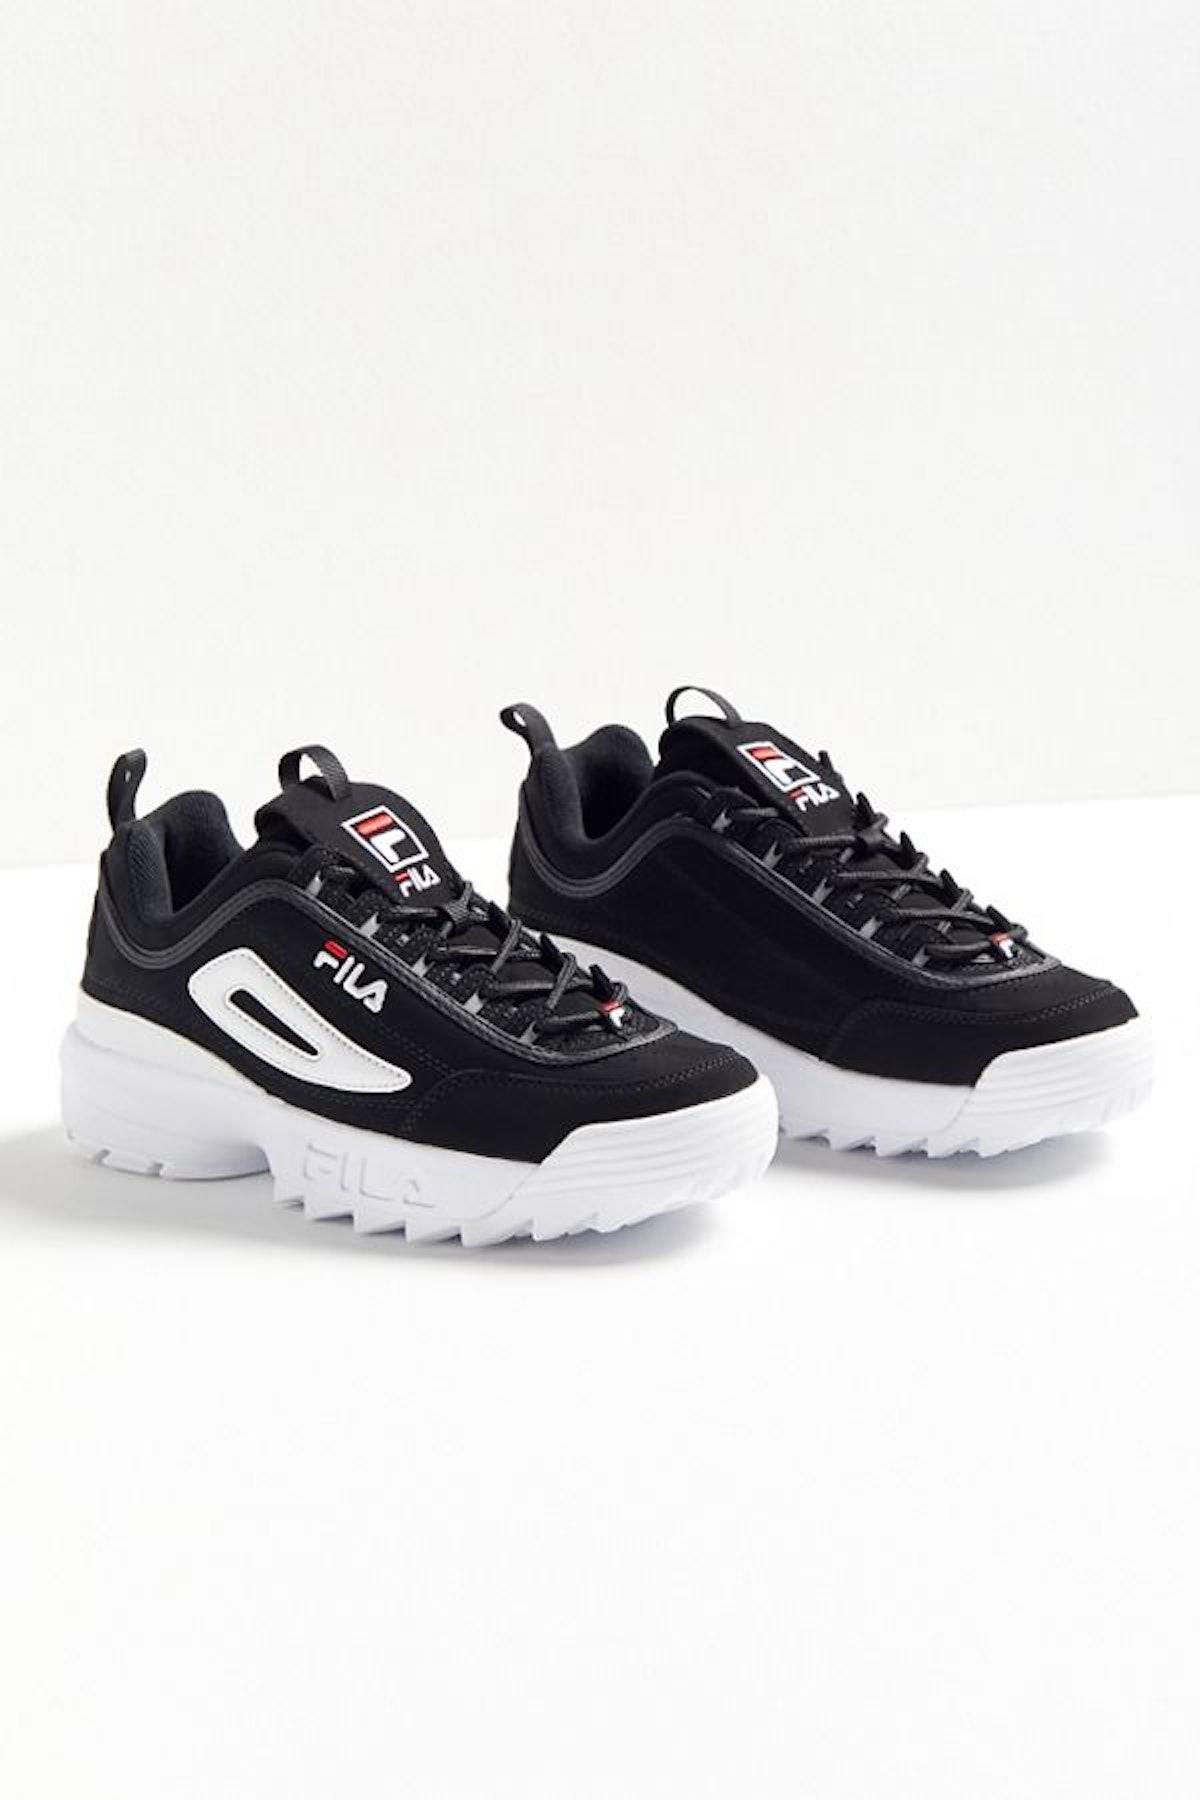 Fila UO Exclusive Disruptor 2 Premium Sneaker